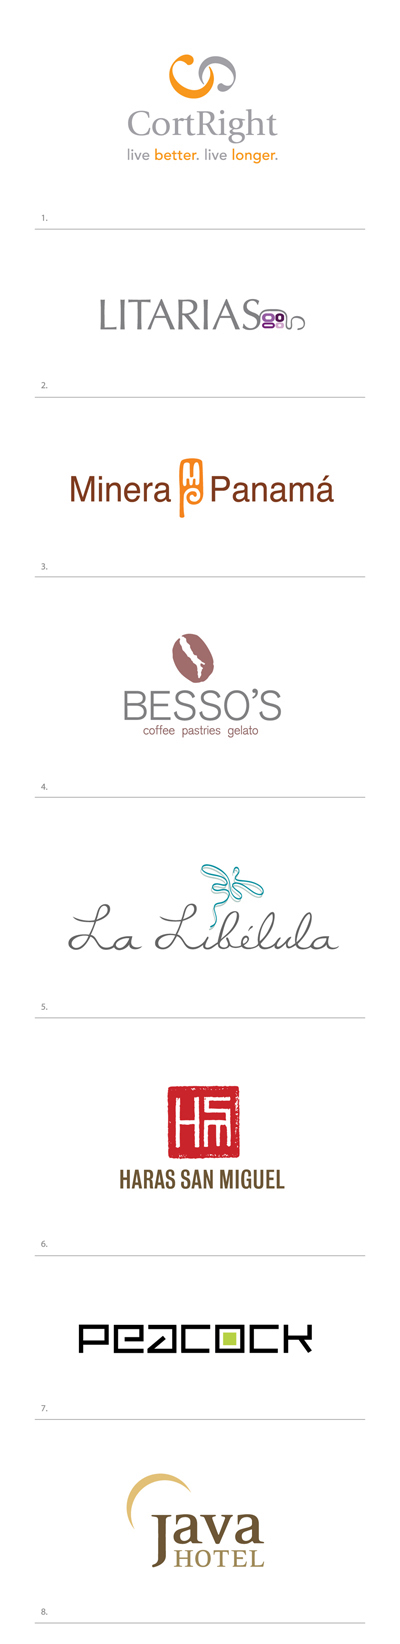 Italian Coffee Shop Logos Italian Coffee Shop